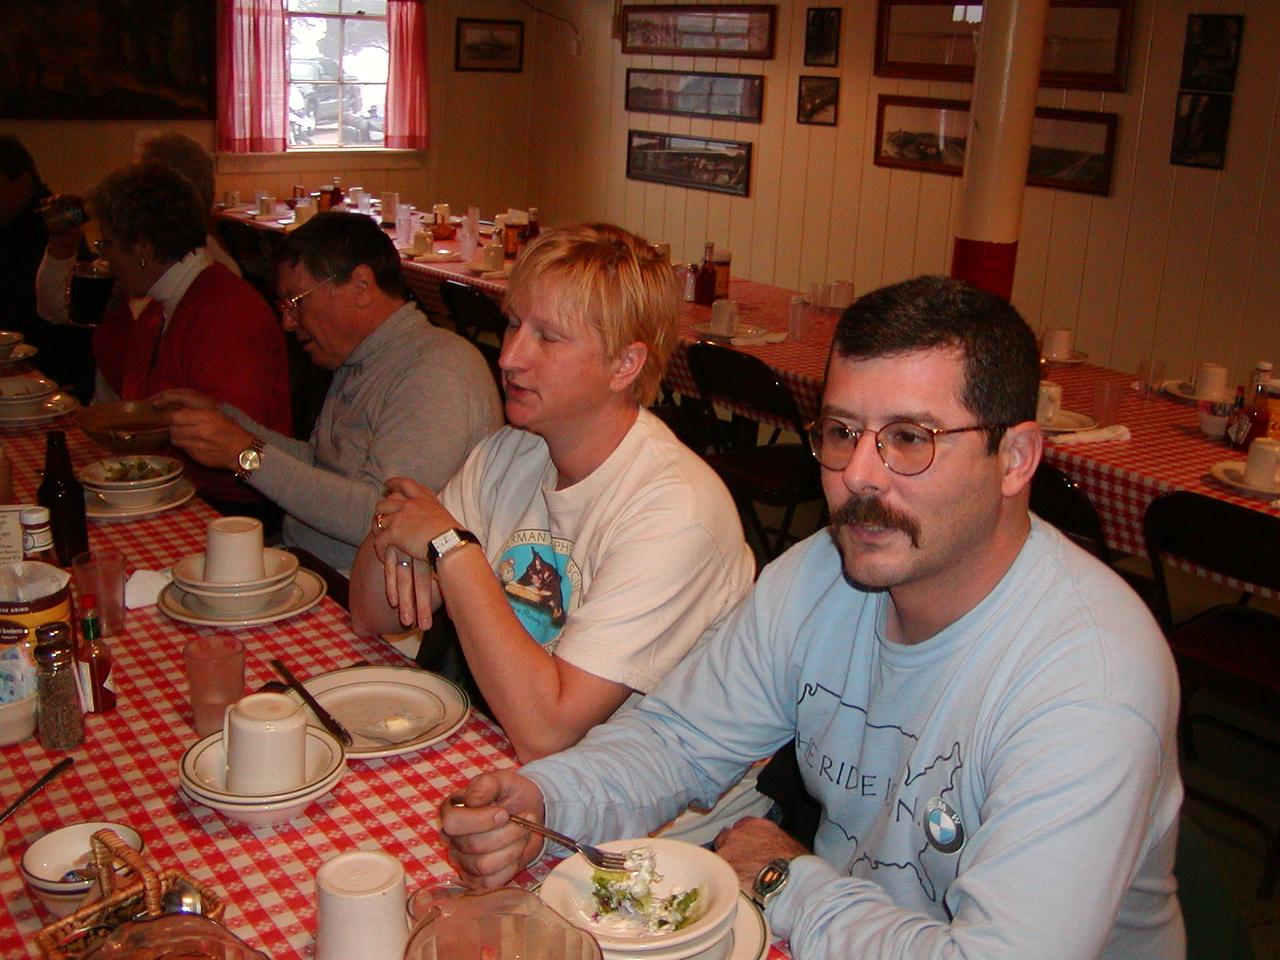 (R to L) Steve Palmer, Michelle Palmer, and Rick Klain